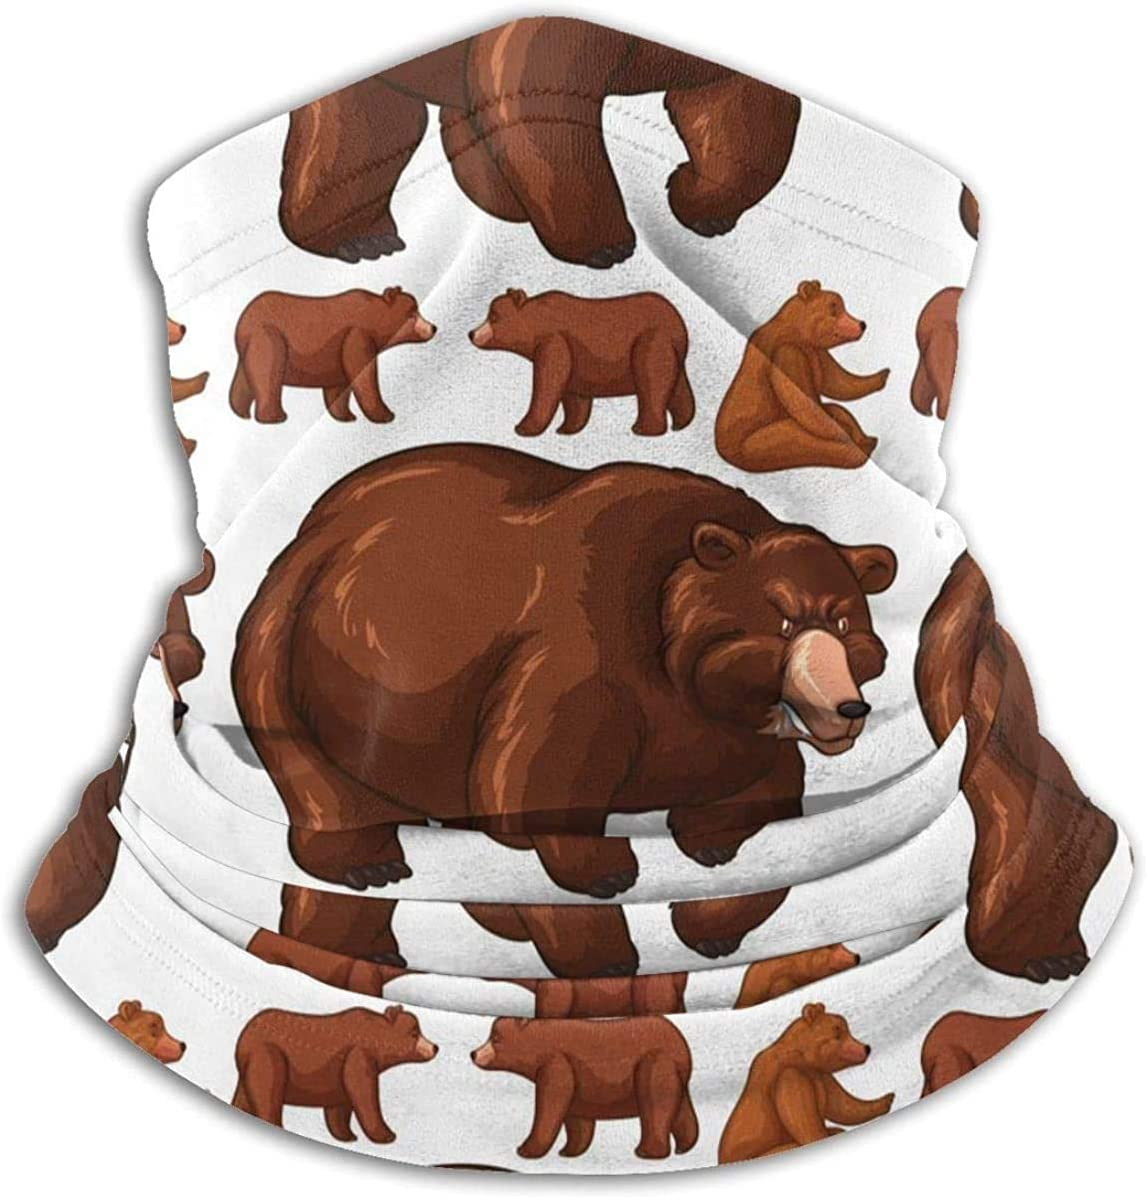 Lastbest Brown Bears Neck Warmer Multifunction Scarf Hat Neck Gaiter Neck Cap Bala Windproof Neck Heating Wrap Outdoor Sports One Size